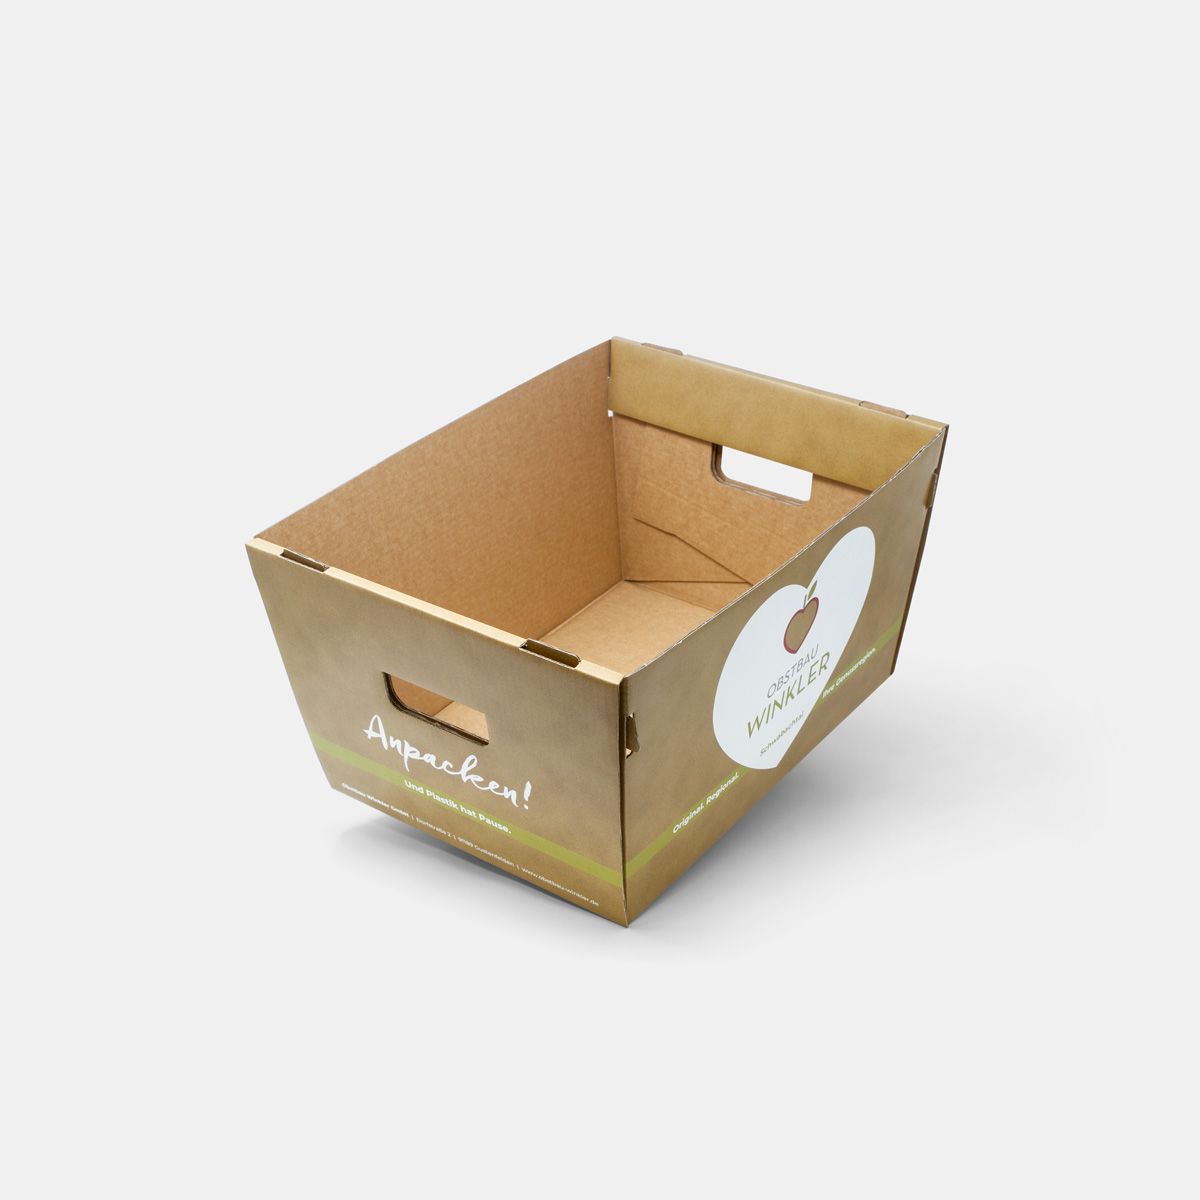 PackSolutions KG - Entwicklung neuer Verpackungslösungen